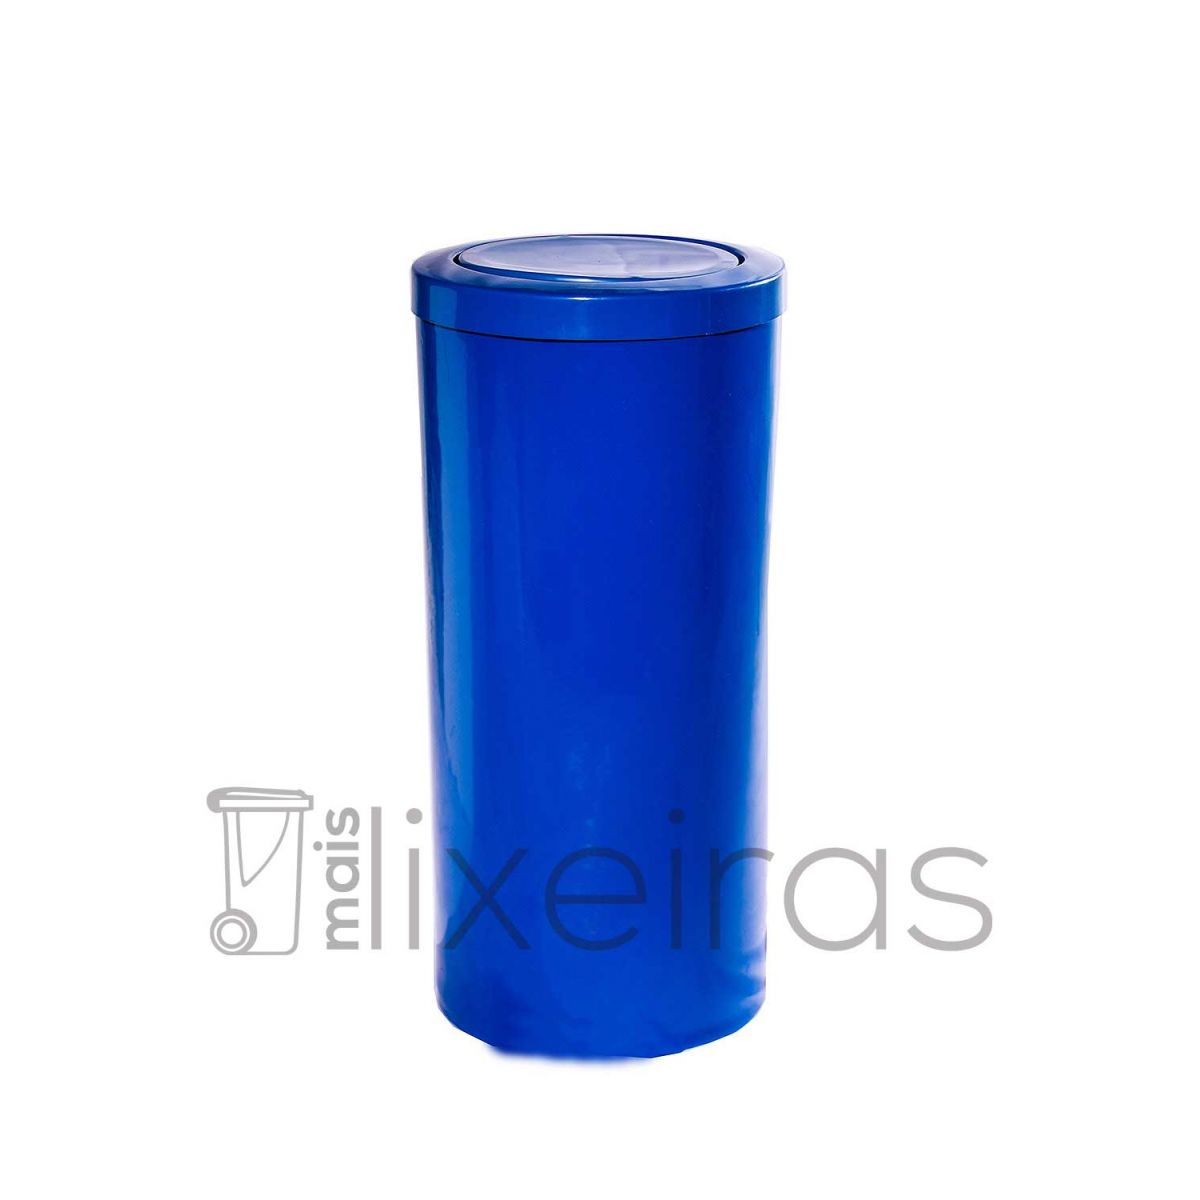 Lixeira plástica grande com tampa flip top - 50 litros